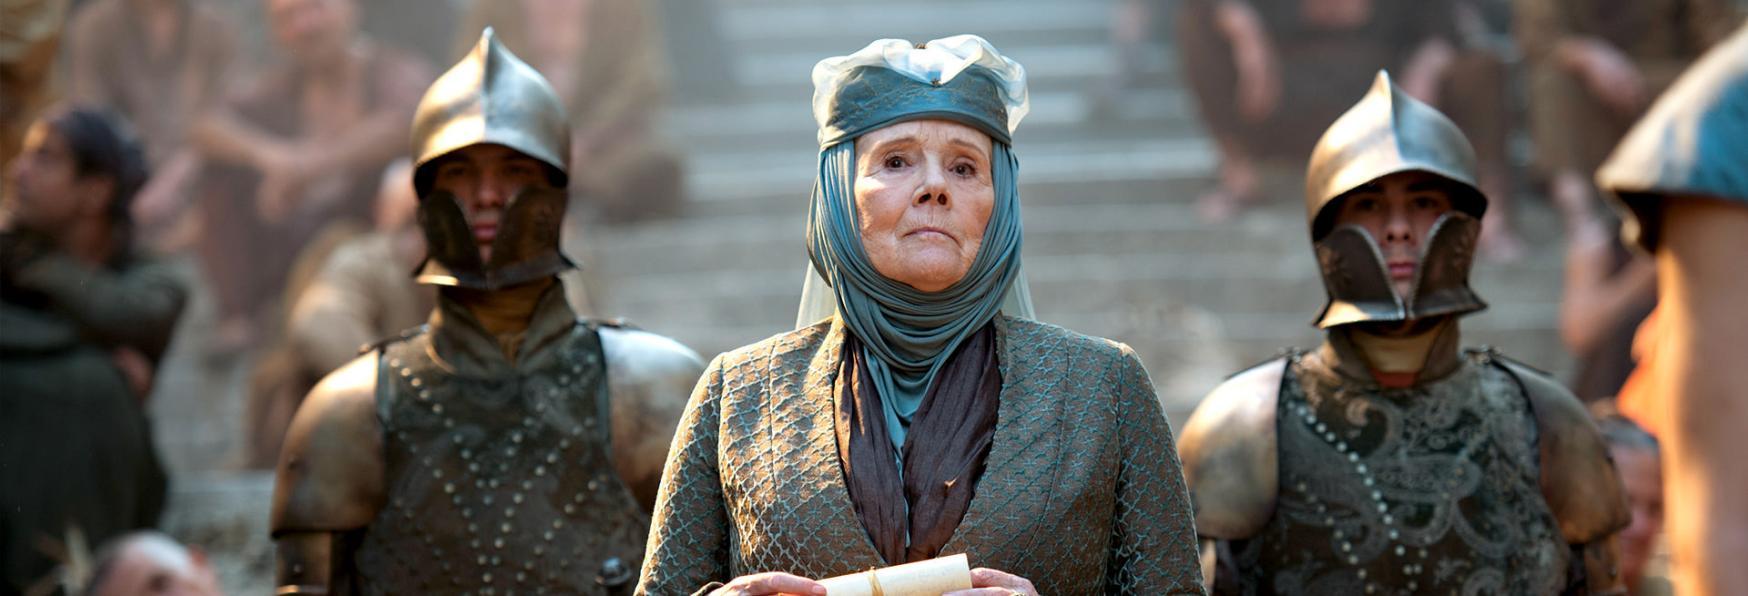 Diana Rigg (Olenna di Game of Thrones) è Morta all'Età di 82 Anni